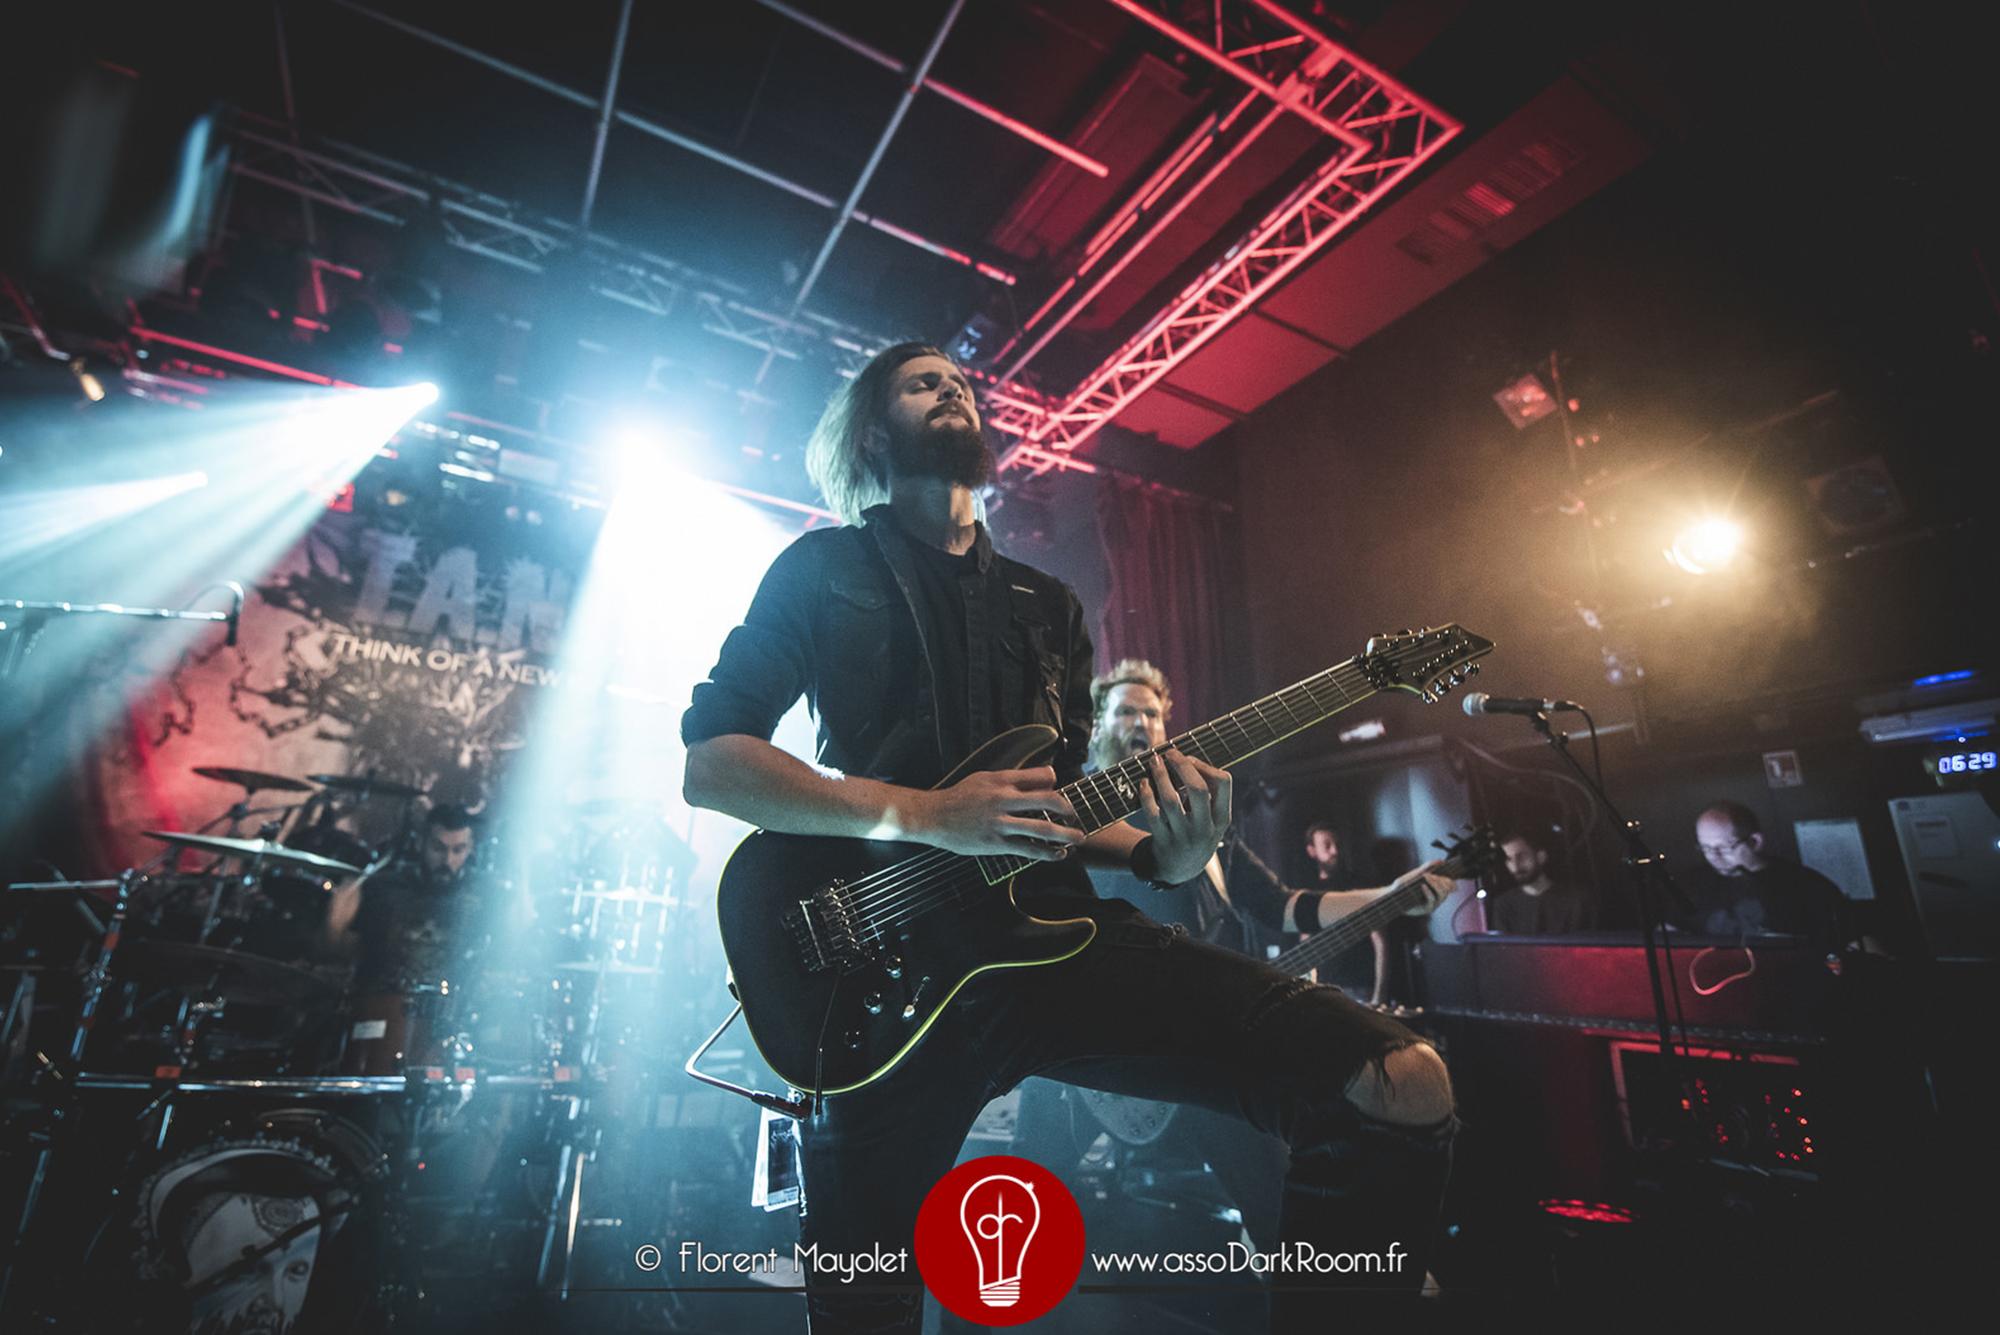 Guitarist_Live4